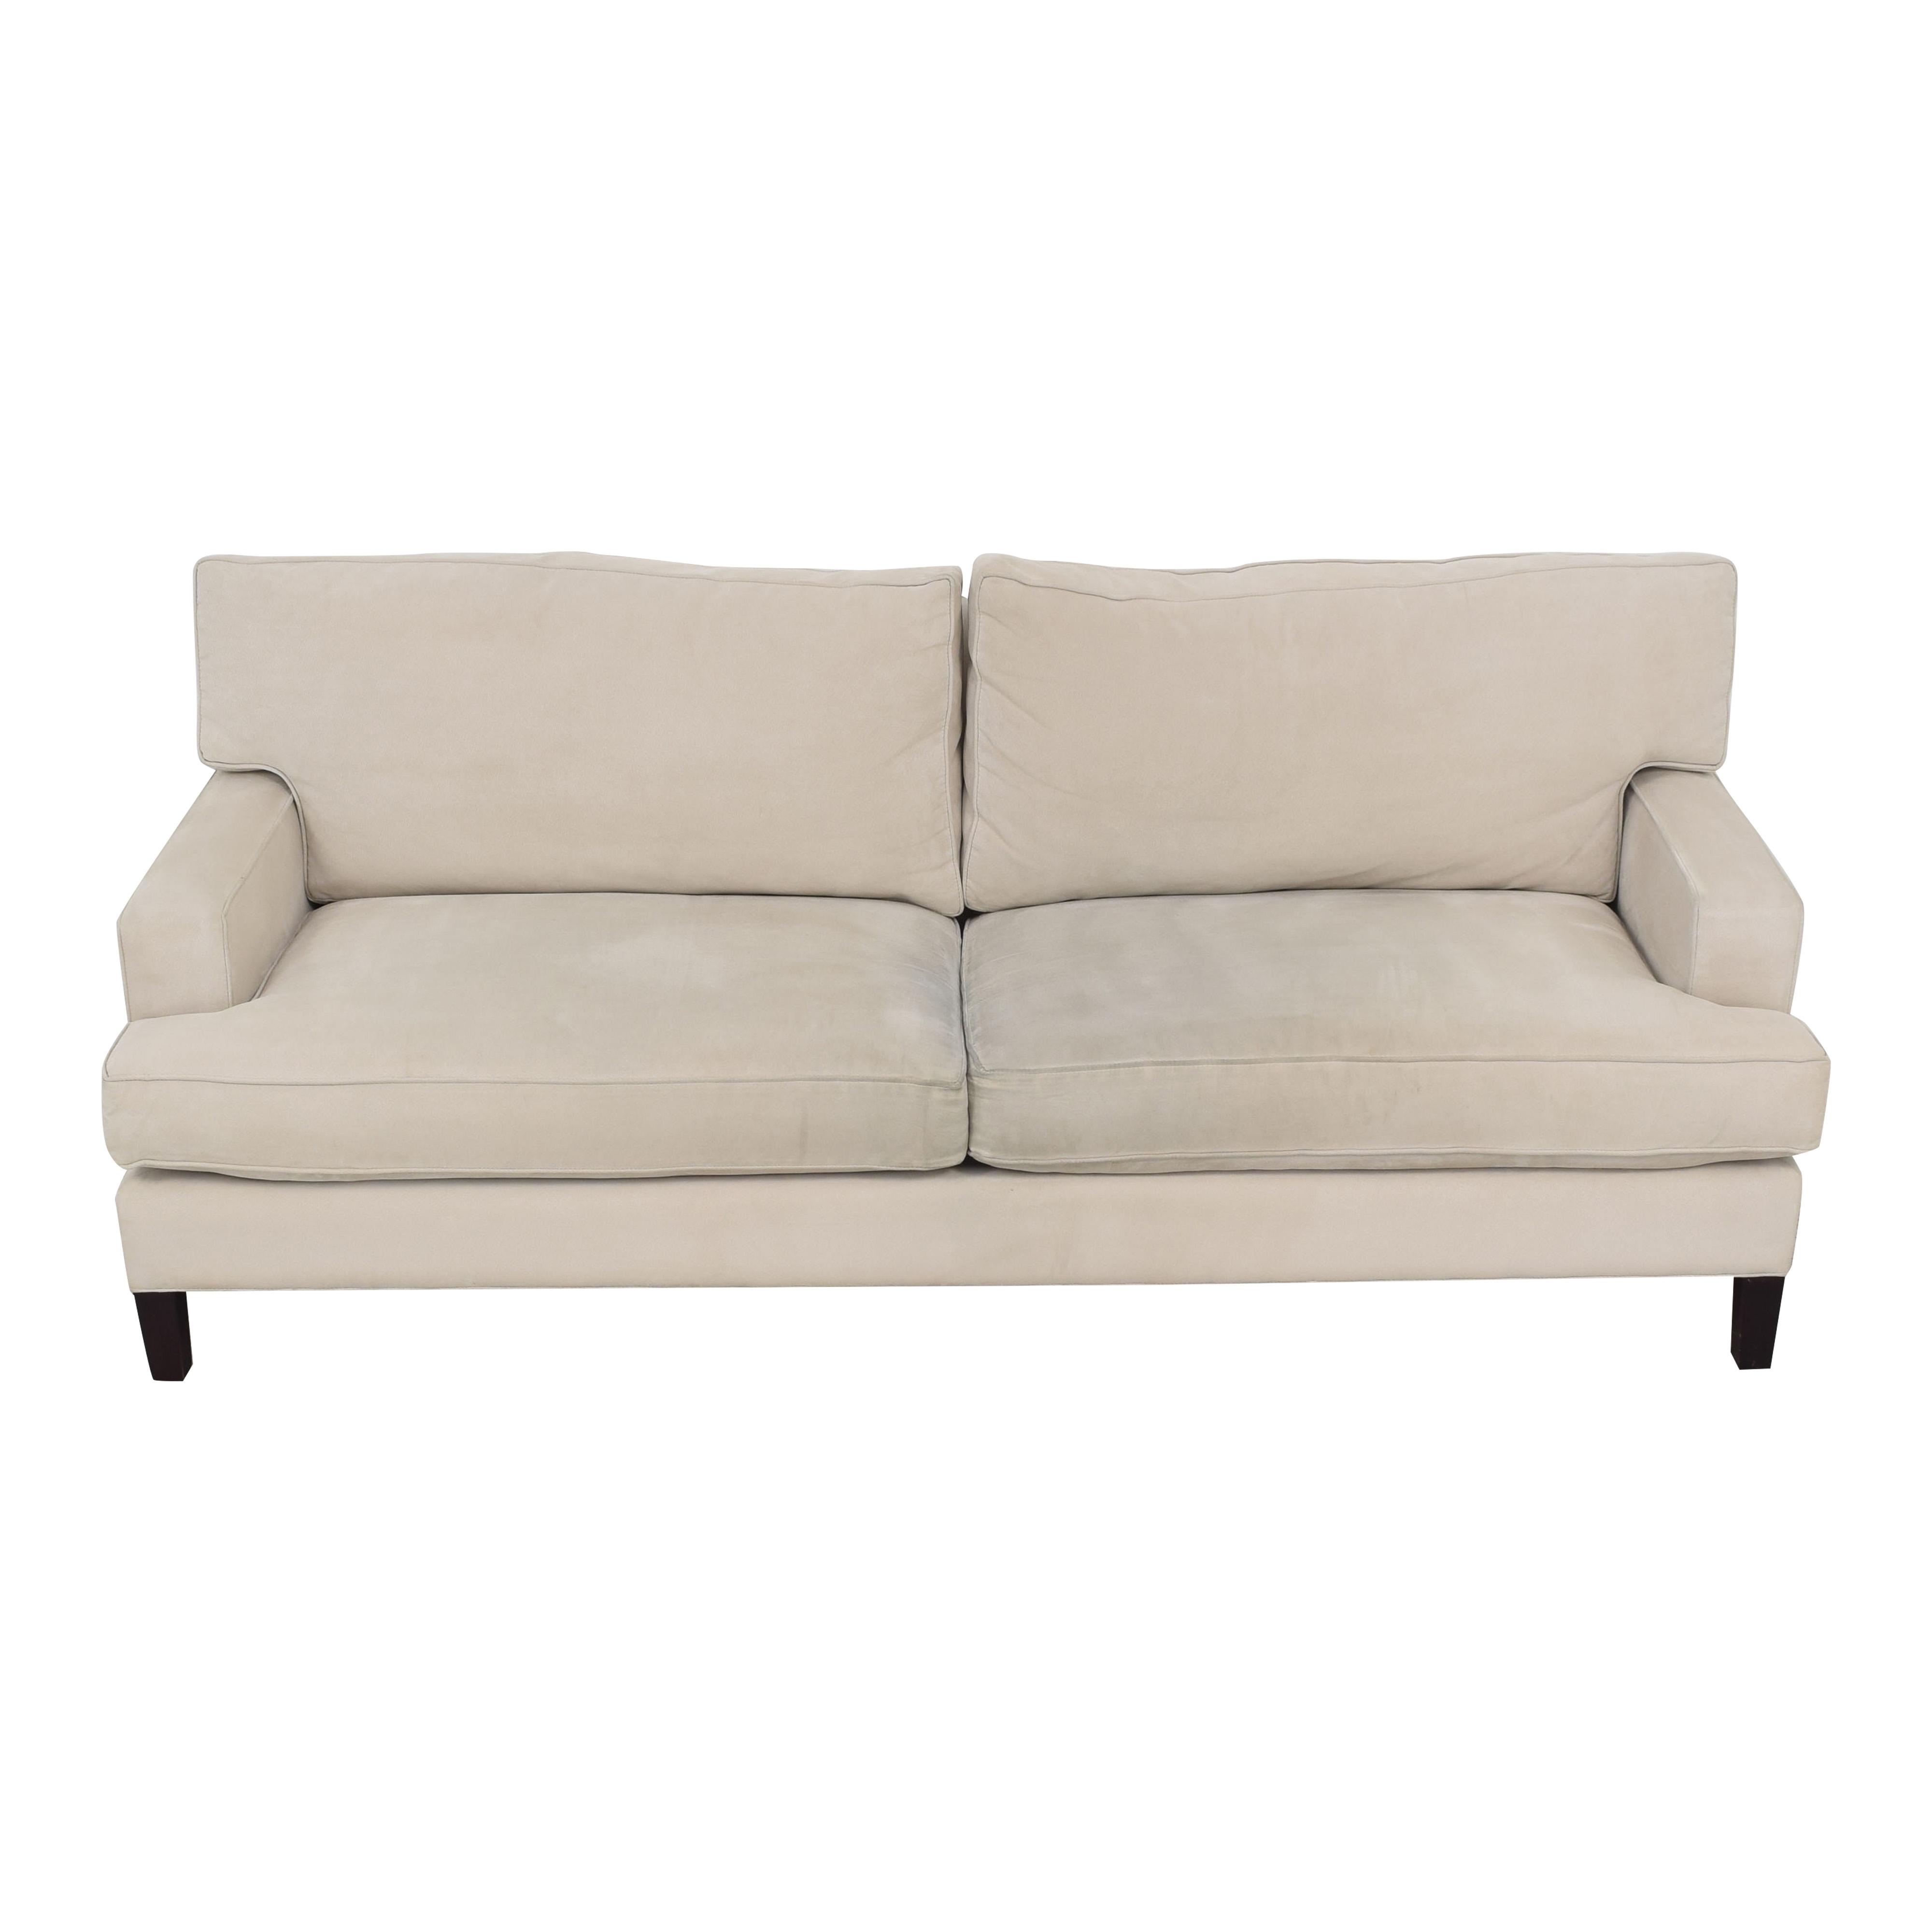 Room & Board Room & Board Hawthorne Sofa Classic Sofas